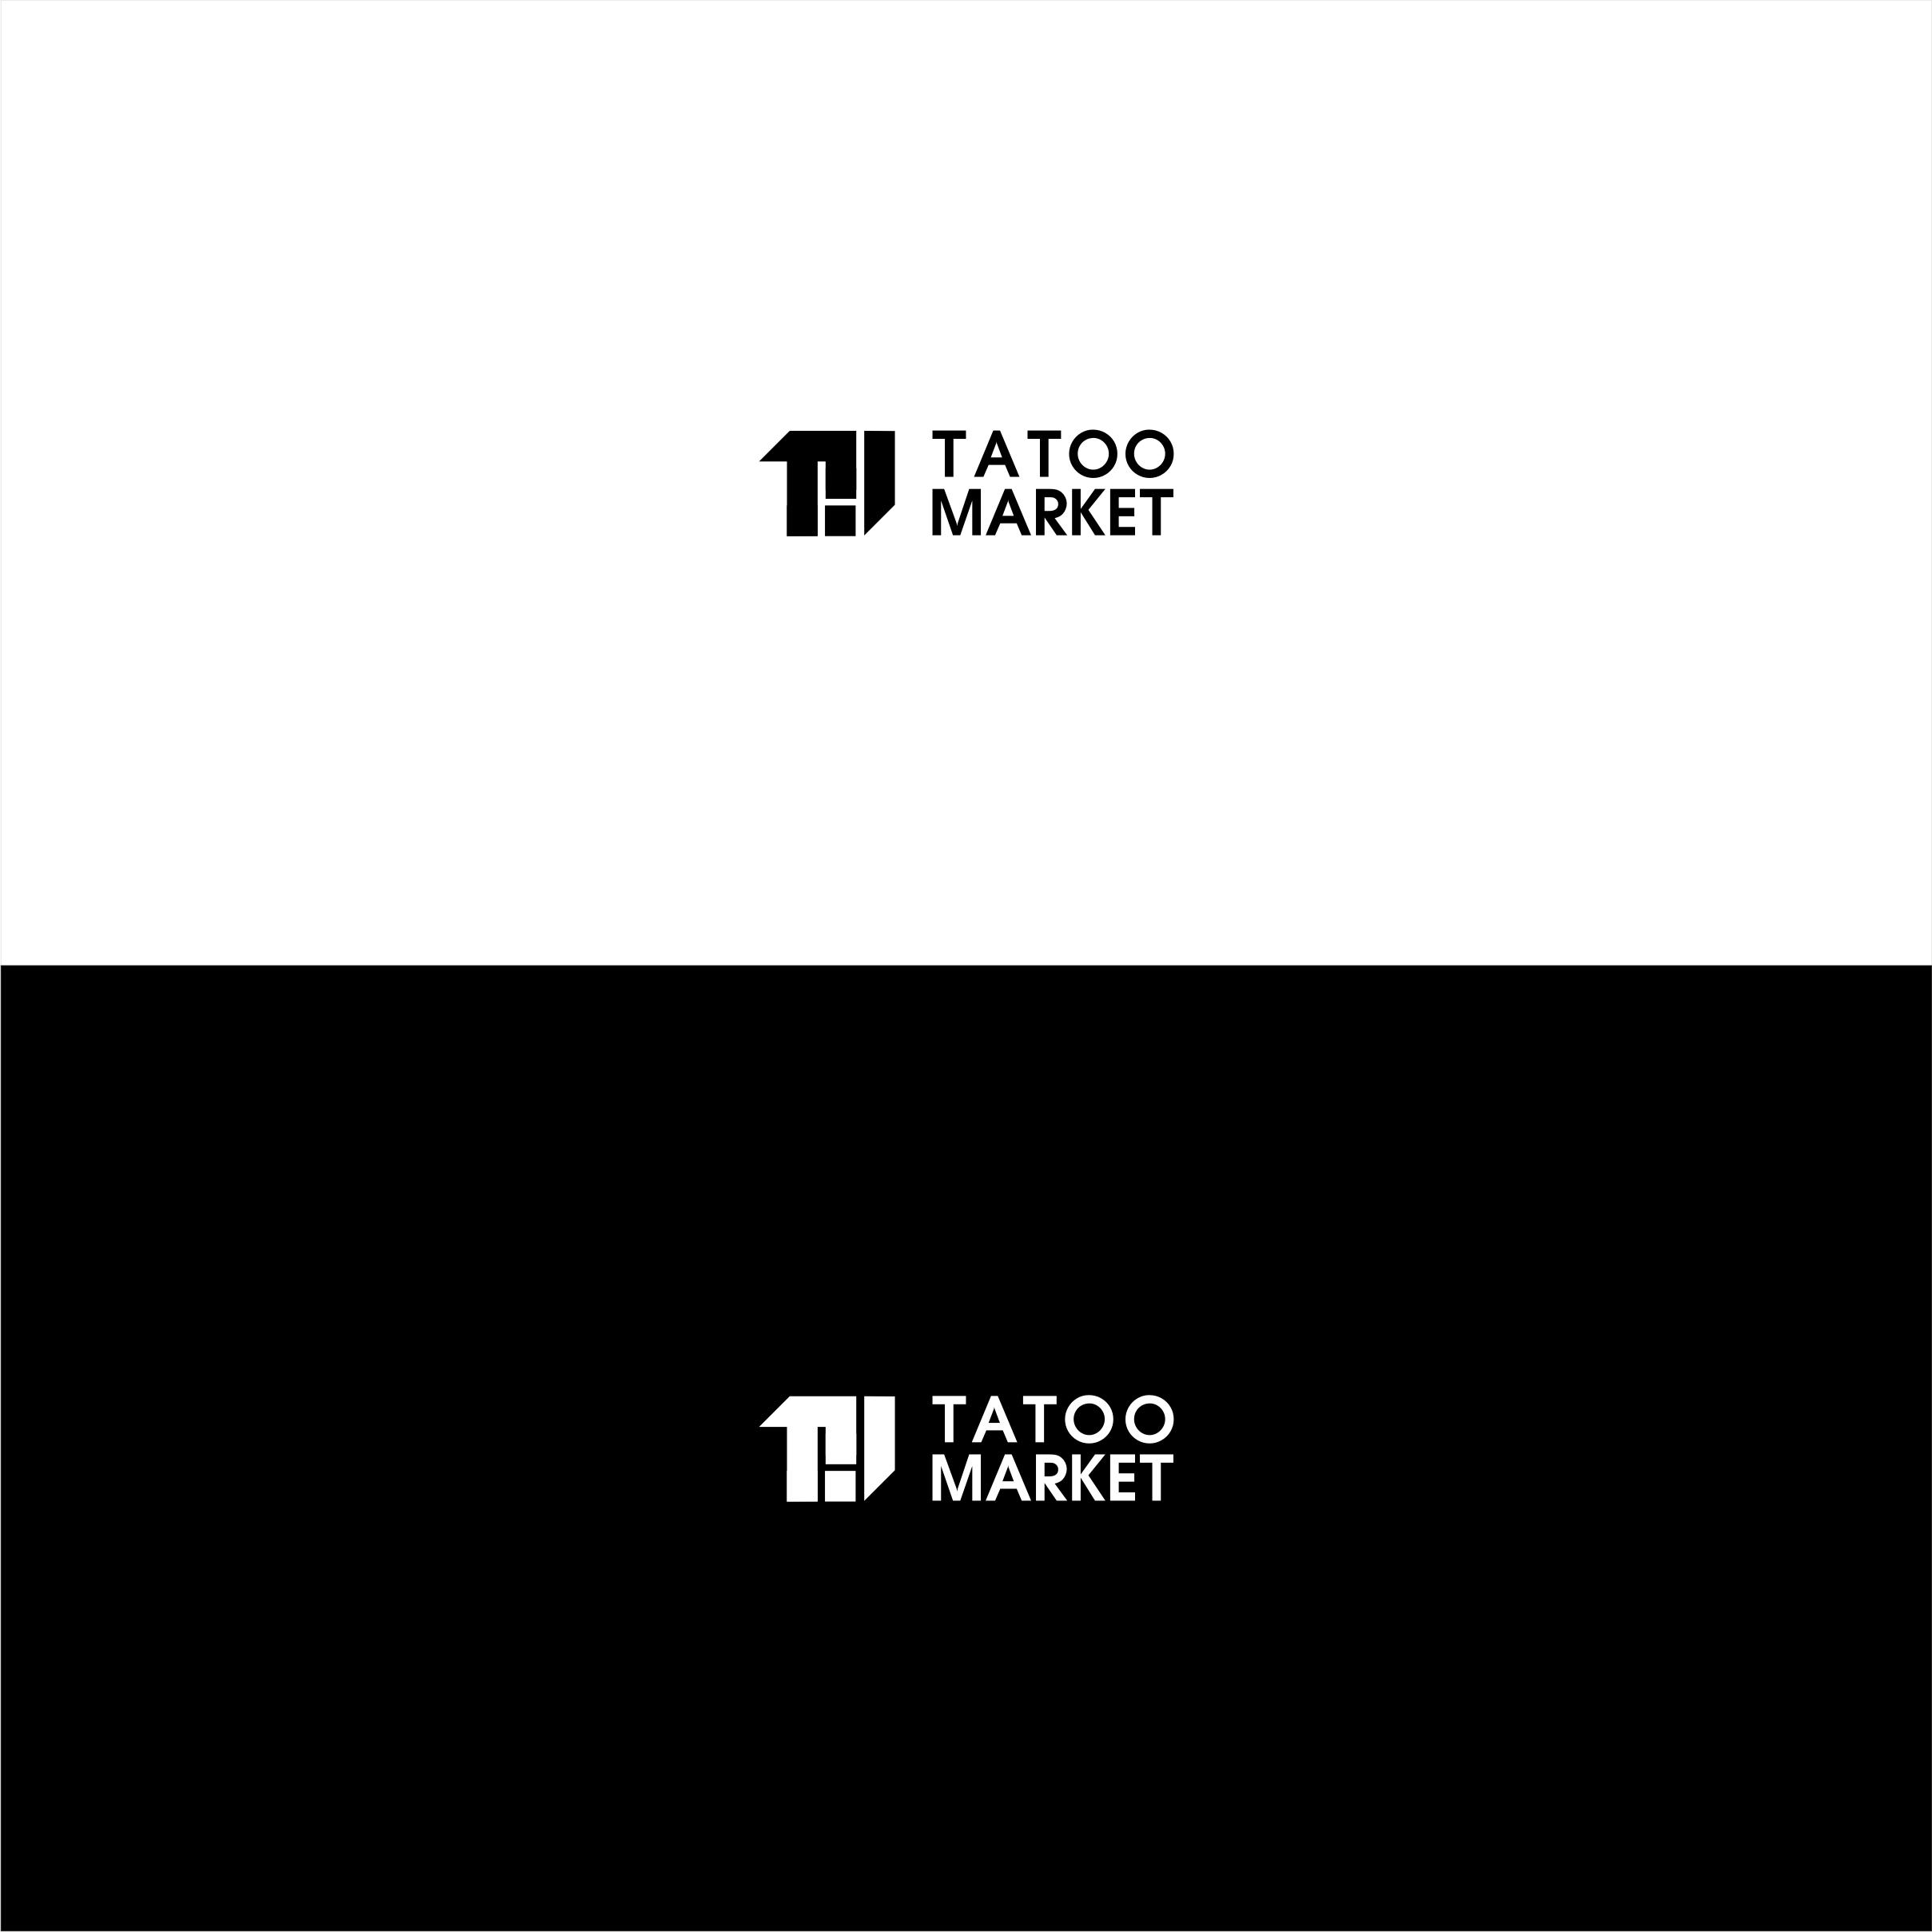 Редизайн логотипа магазина тату оборудования TattooMarket.ru фото f_3455c406feb54b1a.jpg